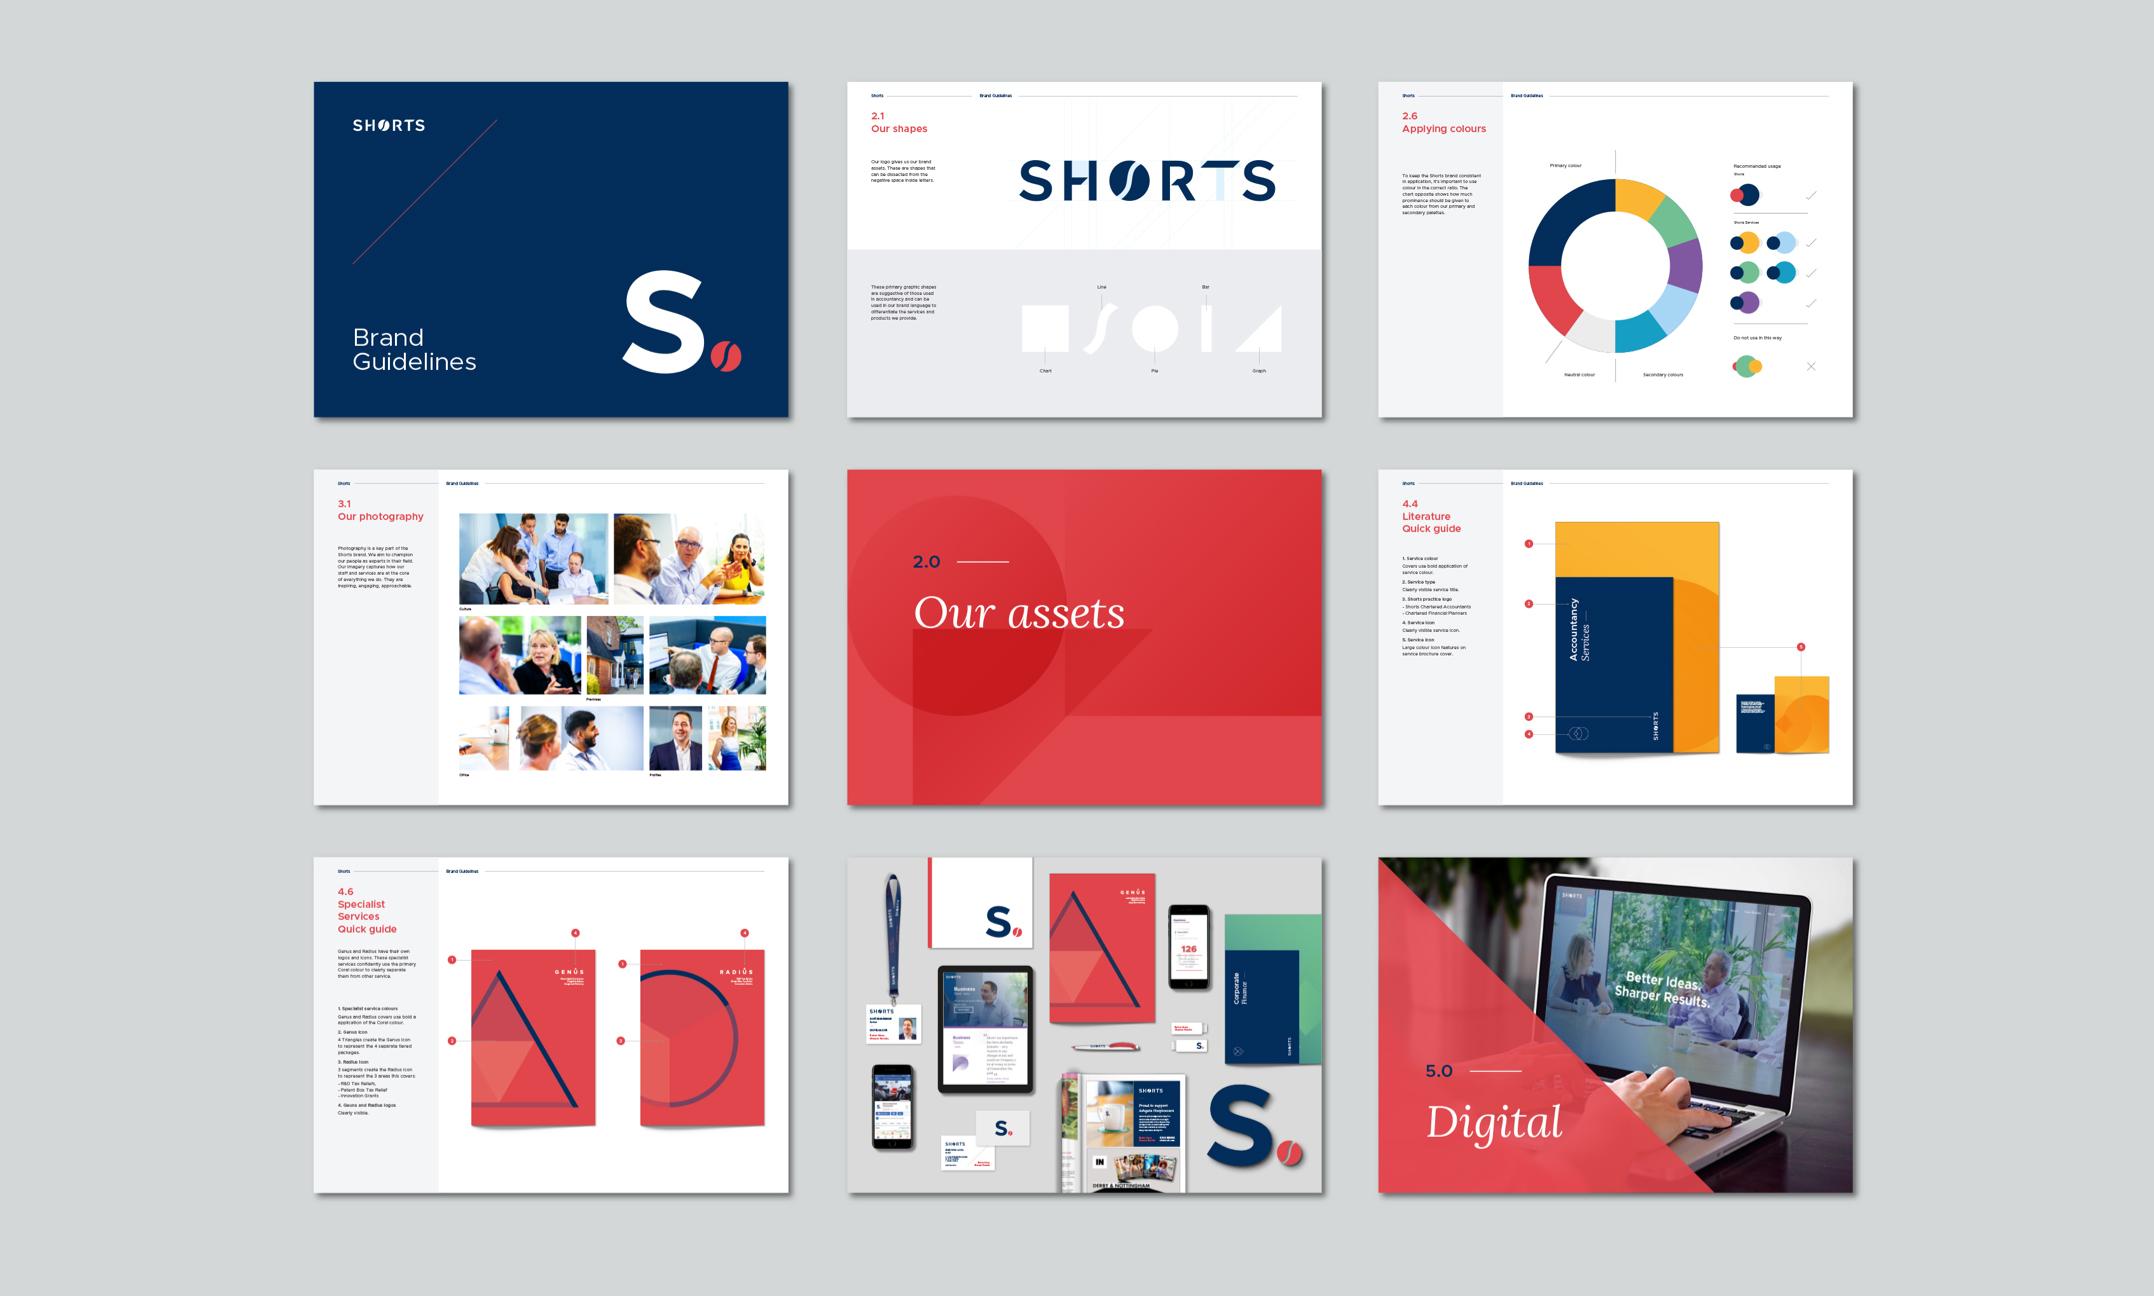 Shorts Radius powerpoint slides